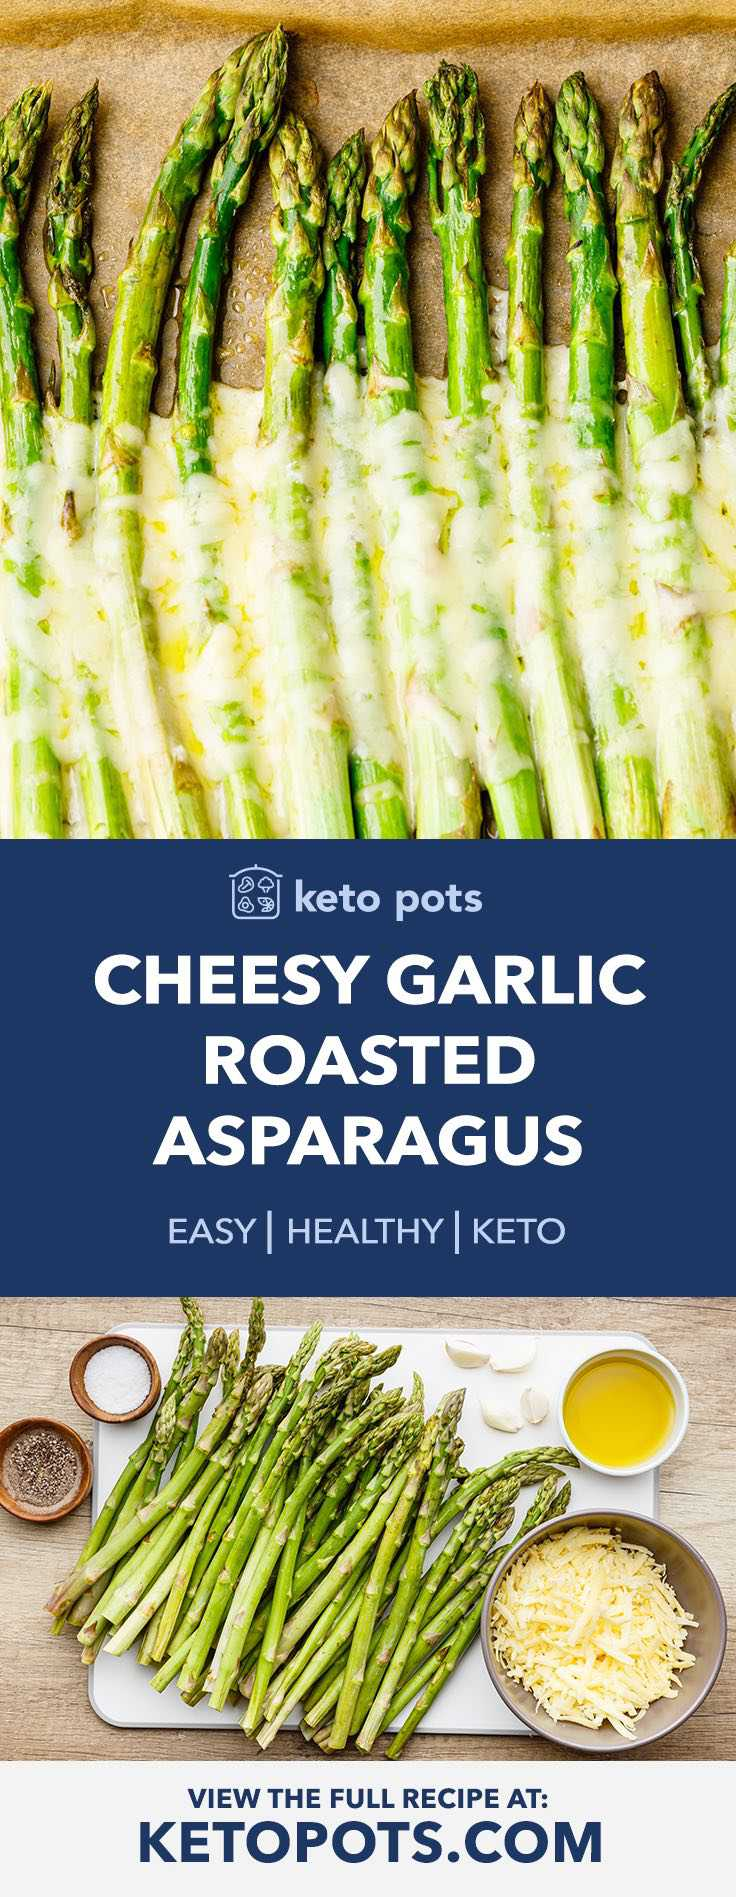 Cheesy Garlic Roasted Keto Asparagus